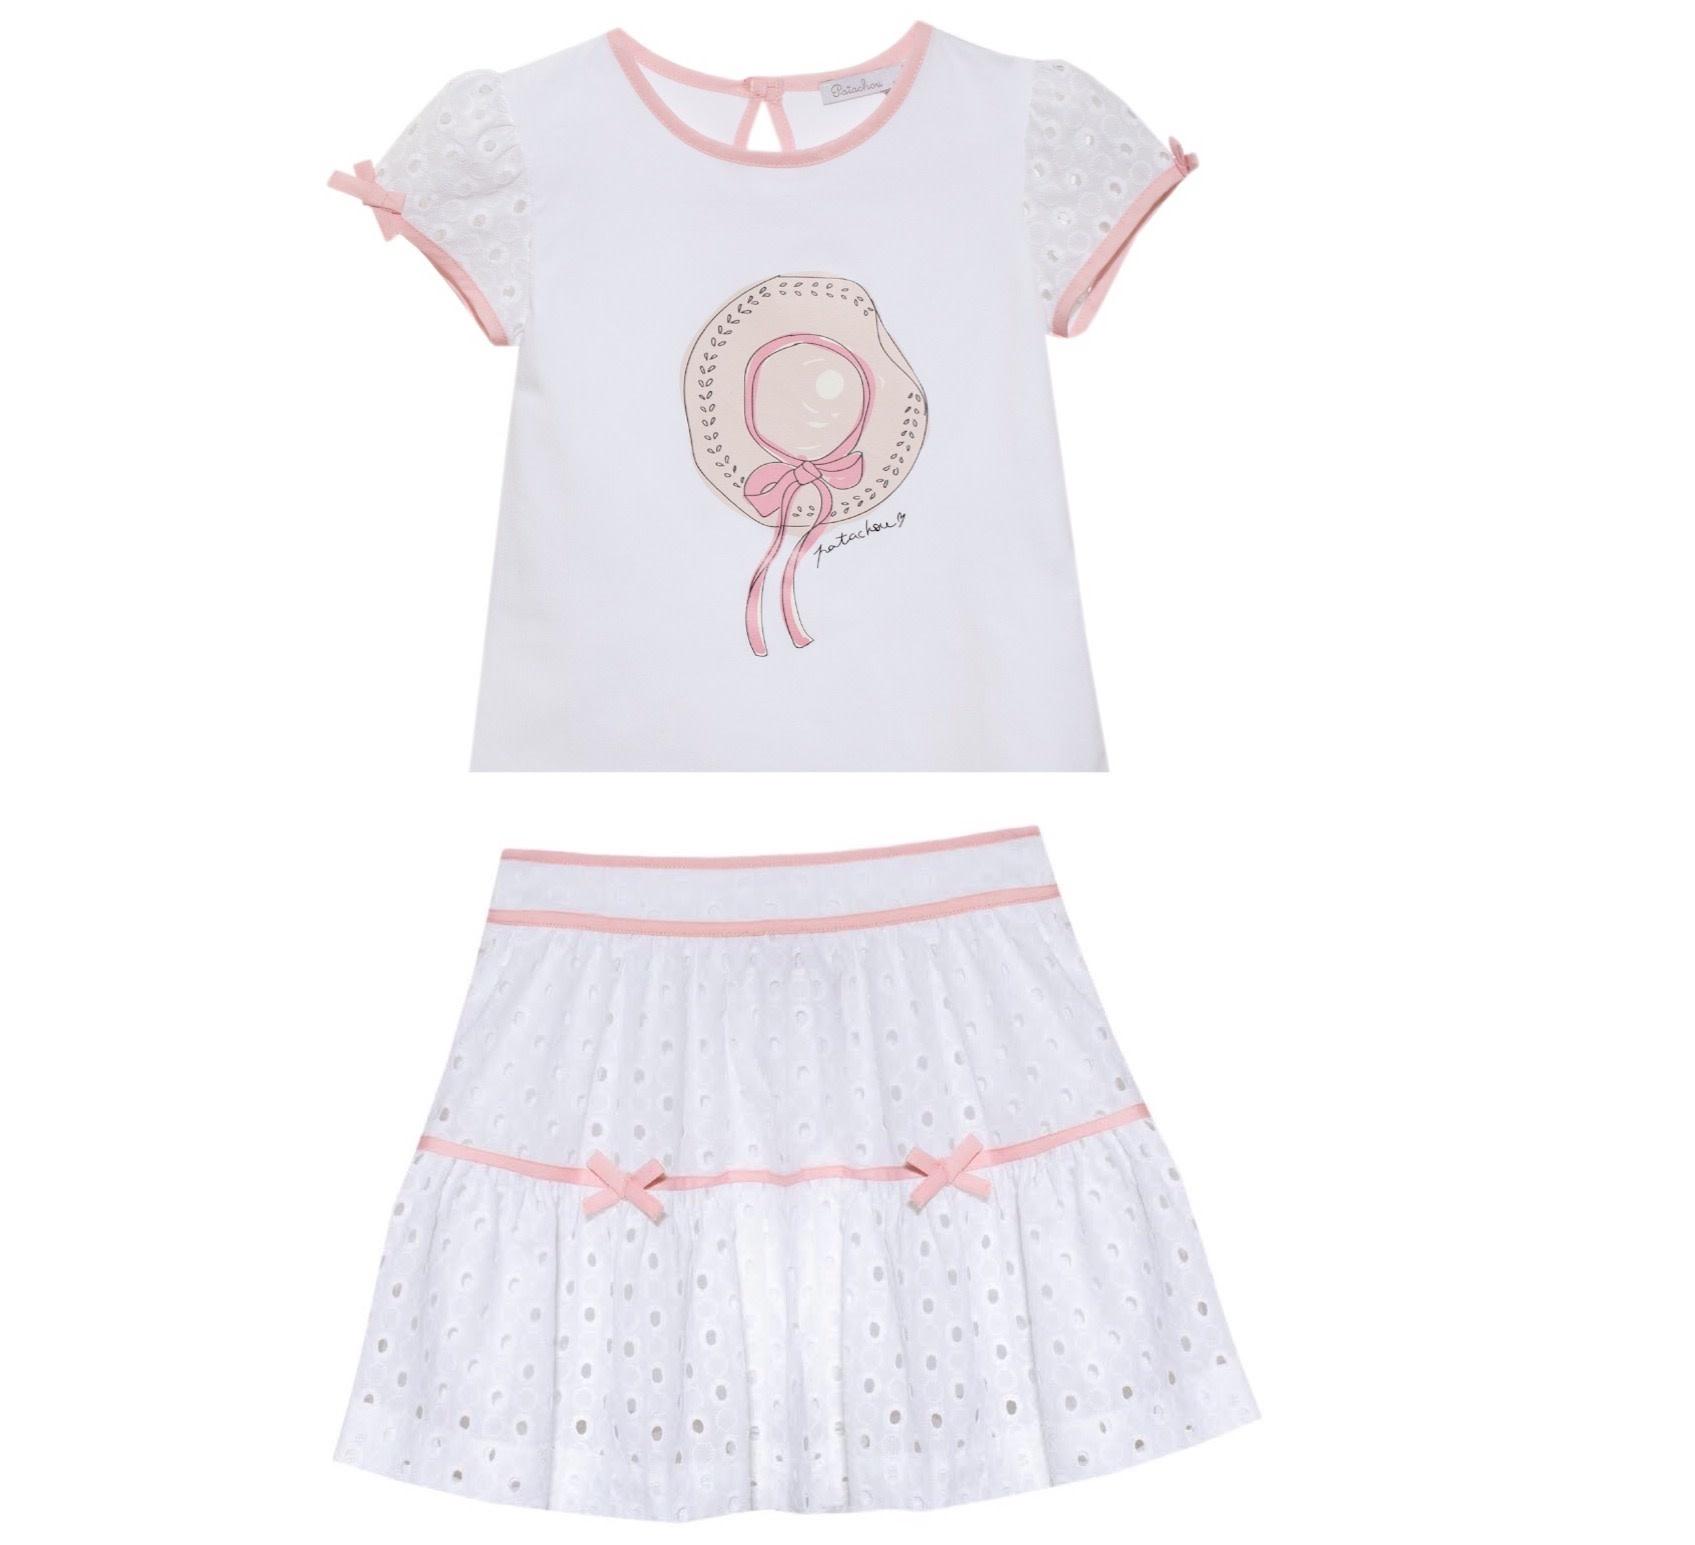 Patachou Patachou 402/407 Hat T-shirt and Skirt Set